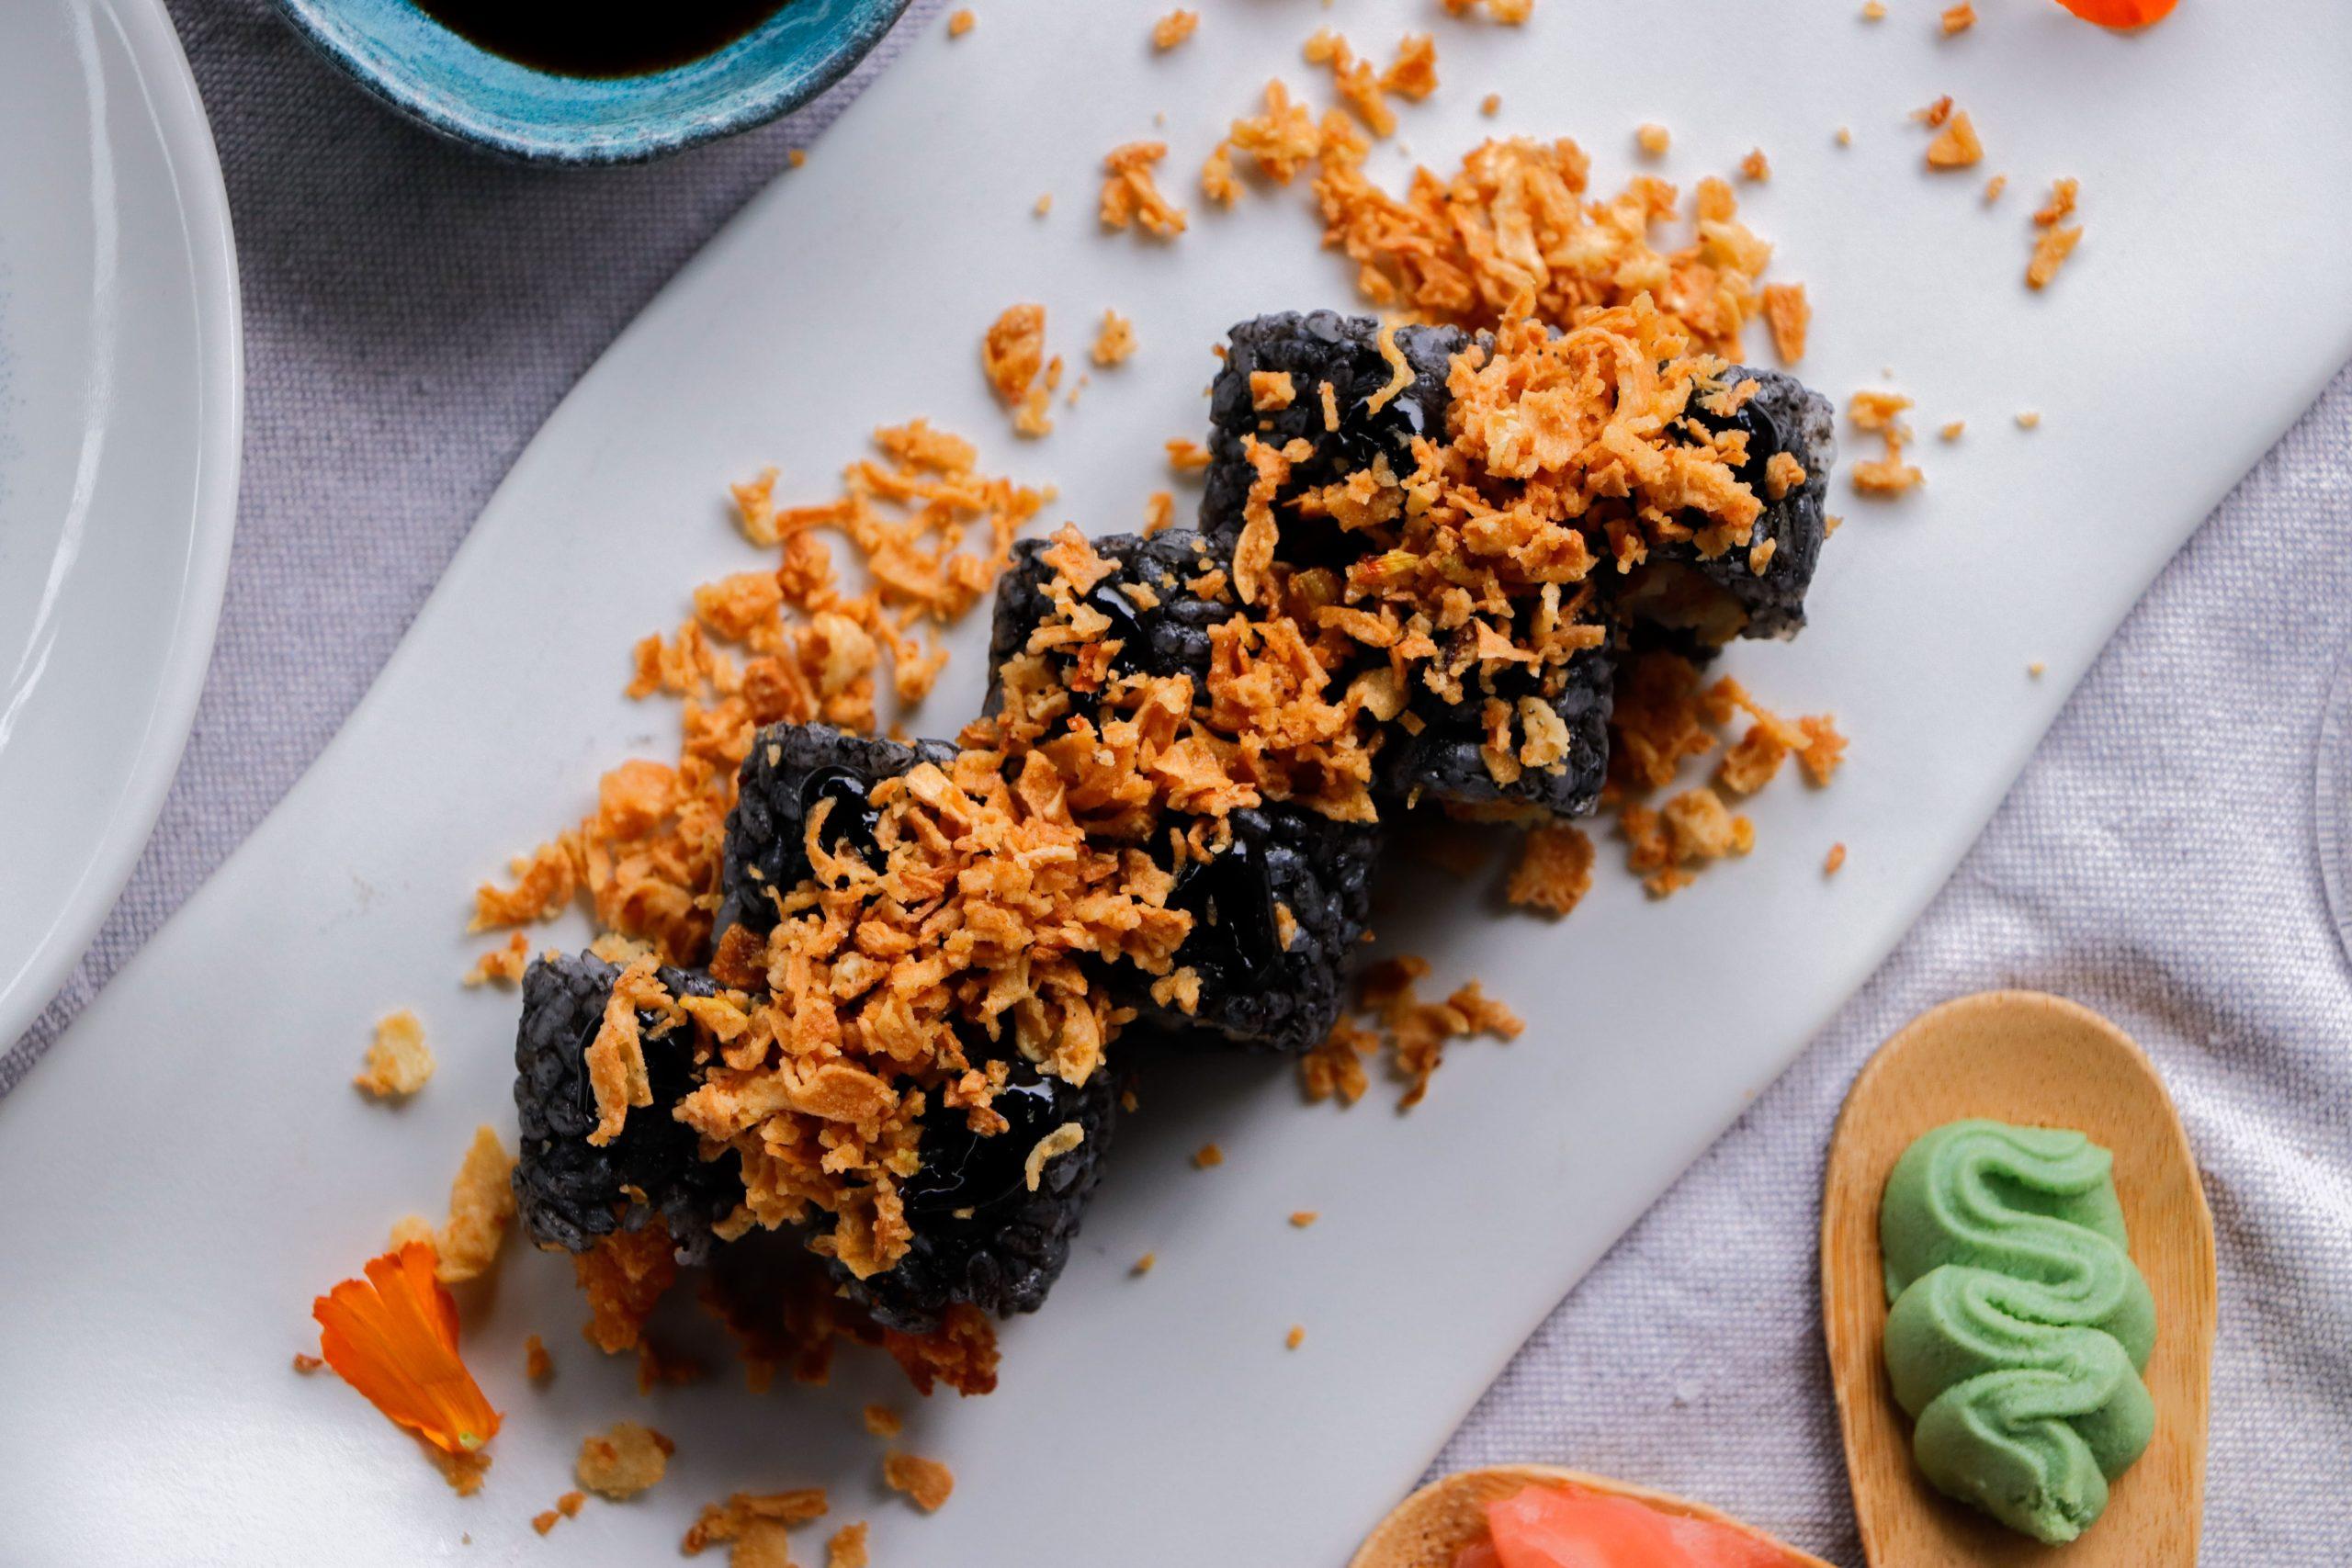 Donde comer sushi en platja d'aro - mejor sushi restaurant en girona - best places to eat sushi in the costa brava 1